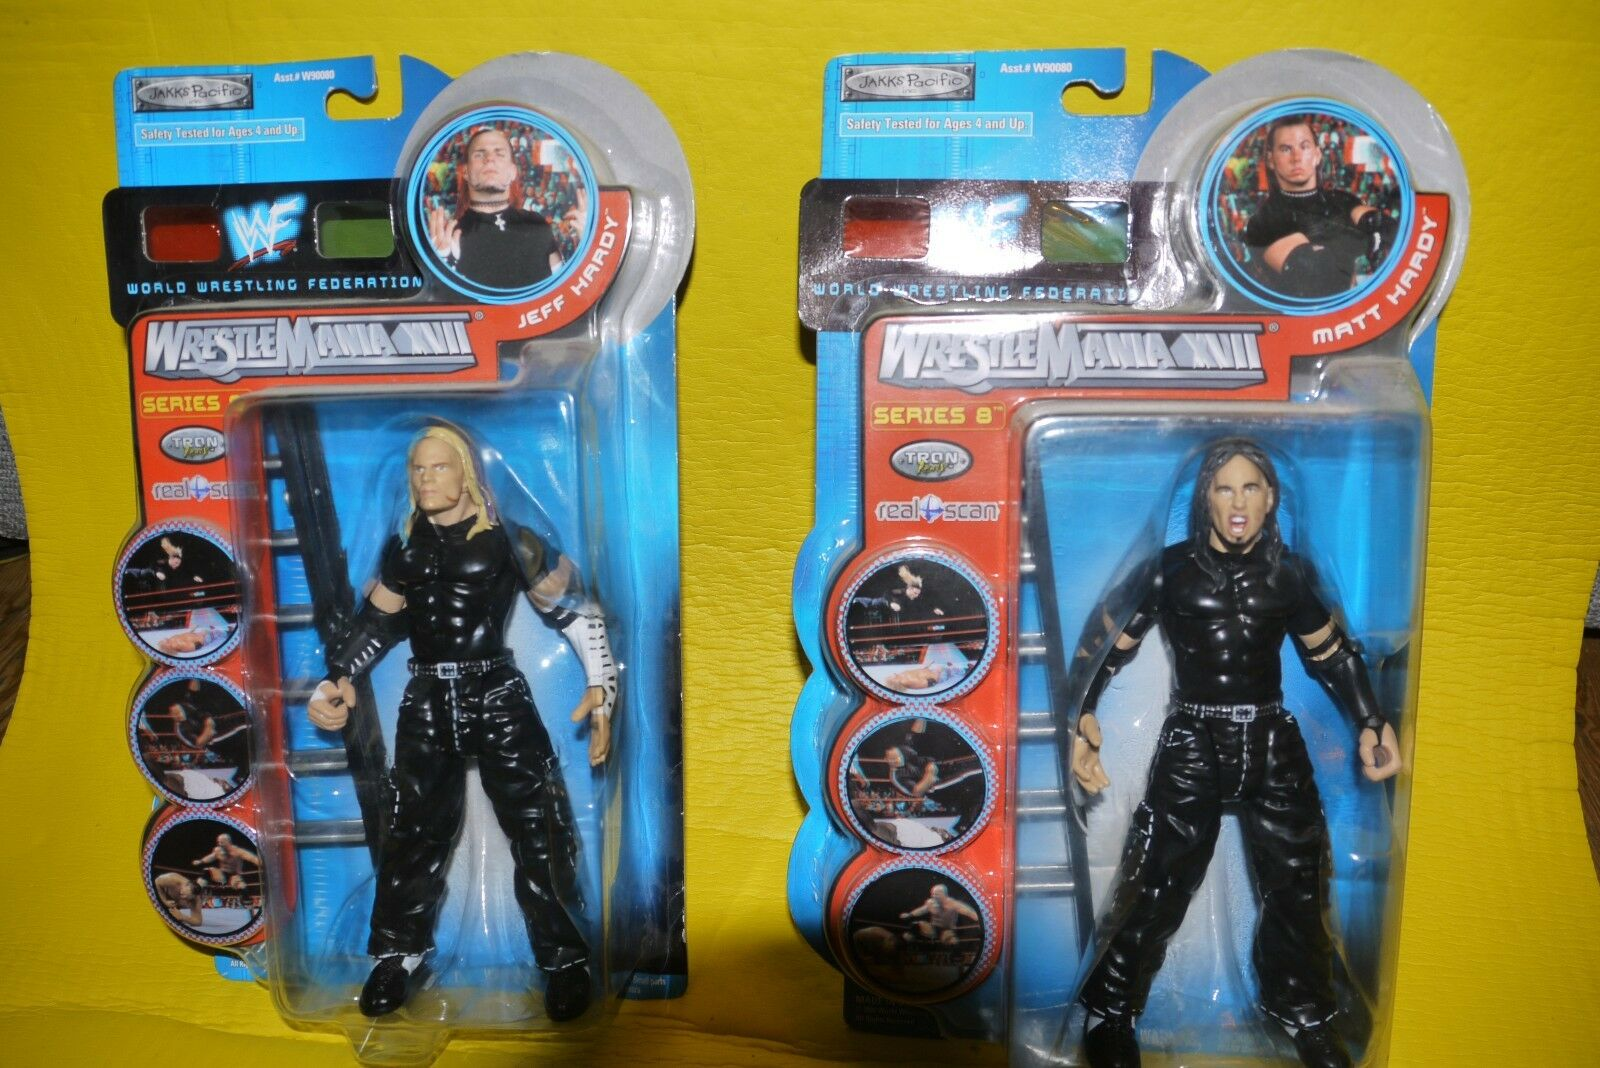 WWF Jeff Hardy Matt Hardy Series 8 Wrestling action figure Tron boxed (rare) WWE